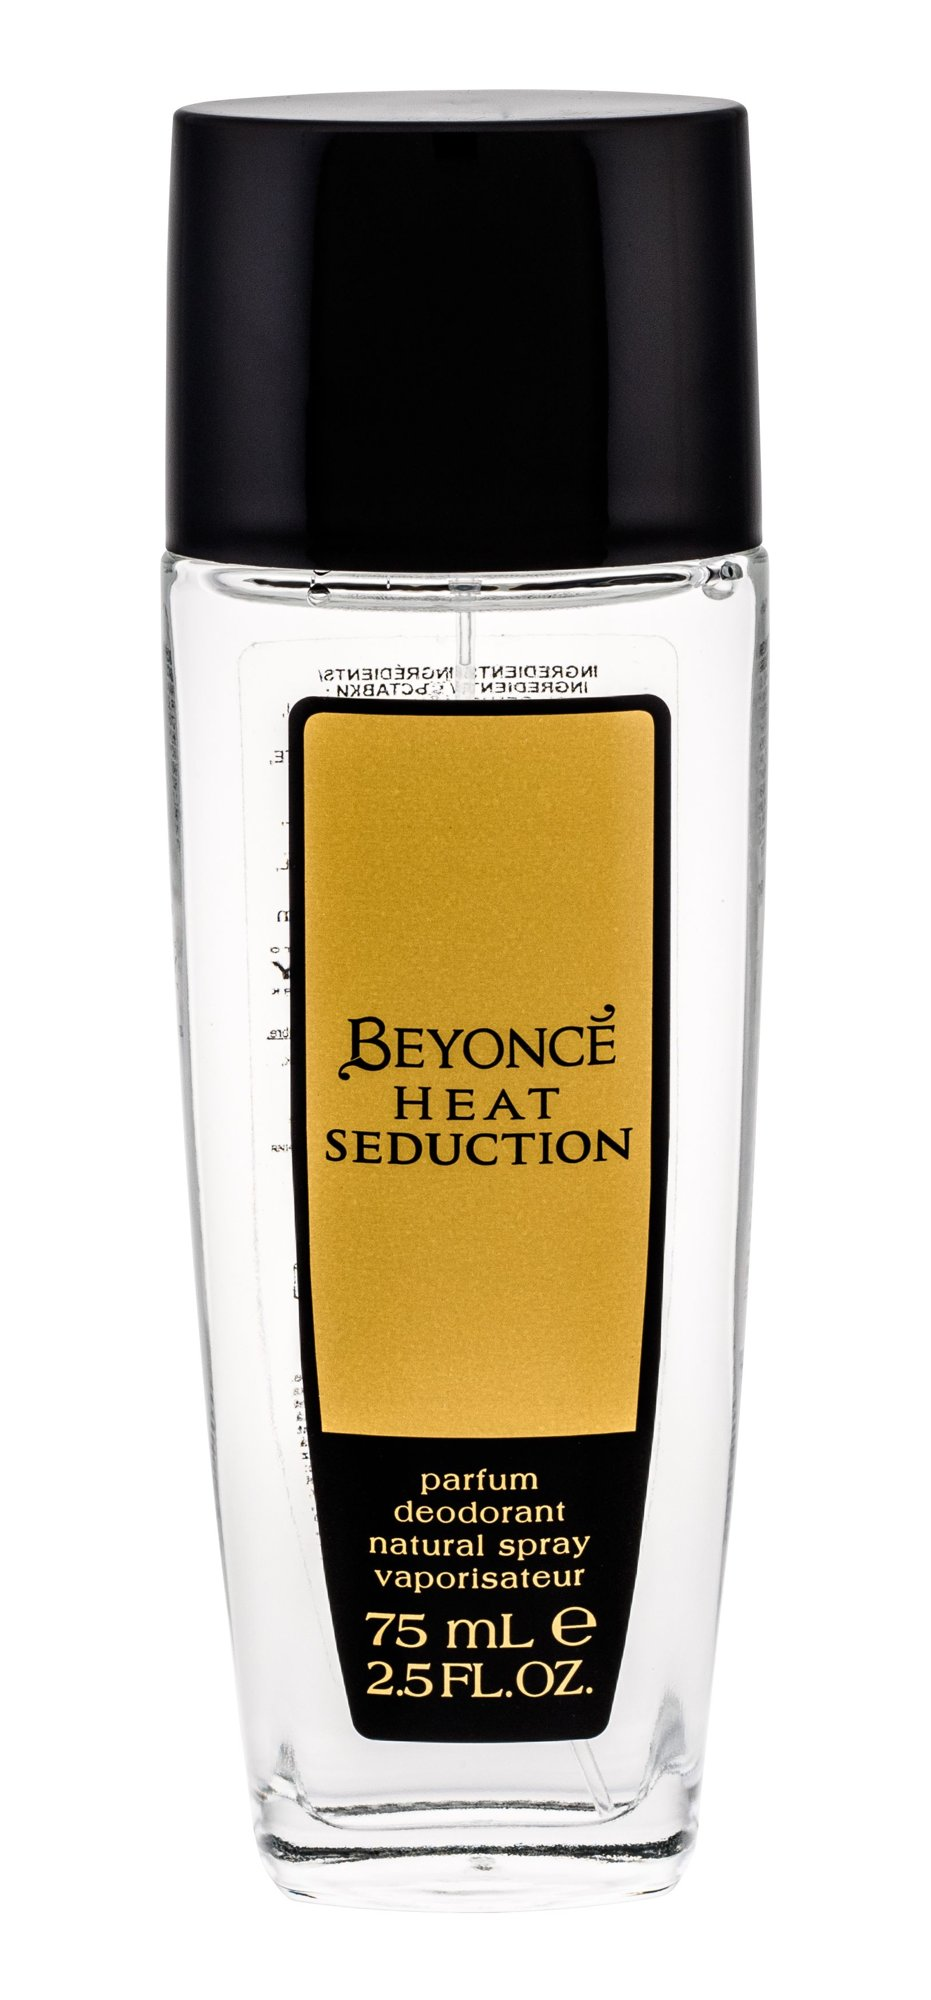 Beyonce Heat Seduction, Deodorant v skle 75ml